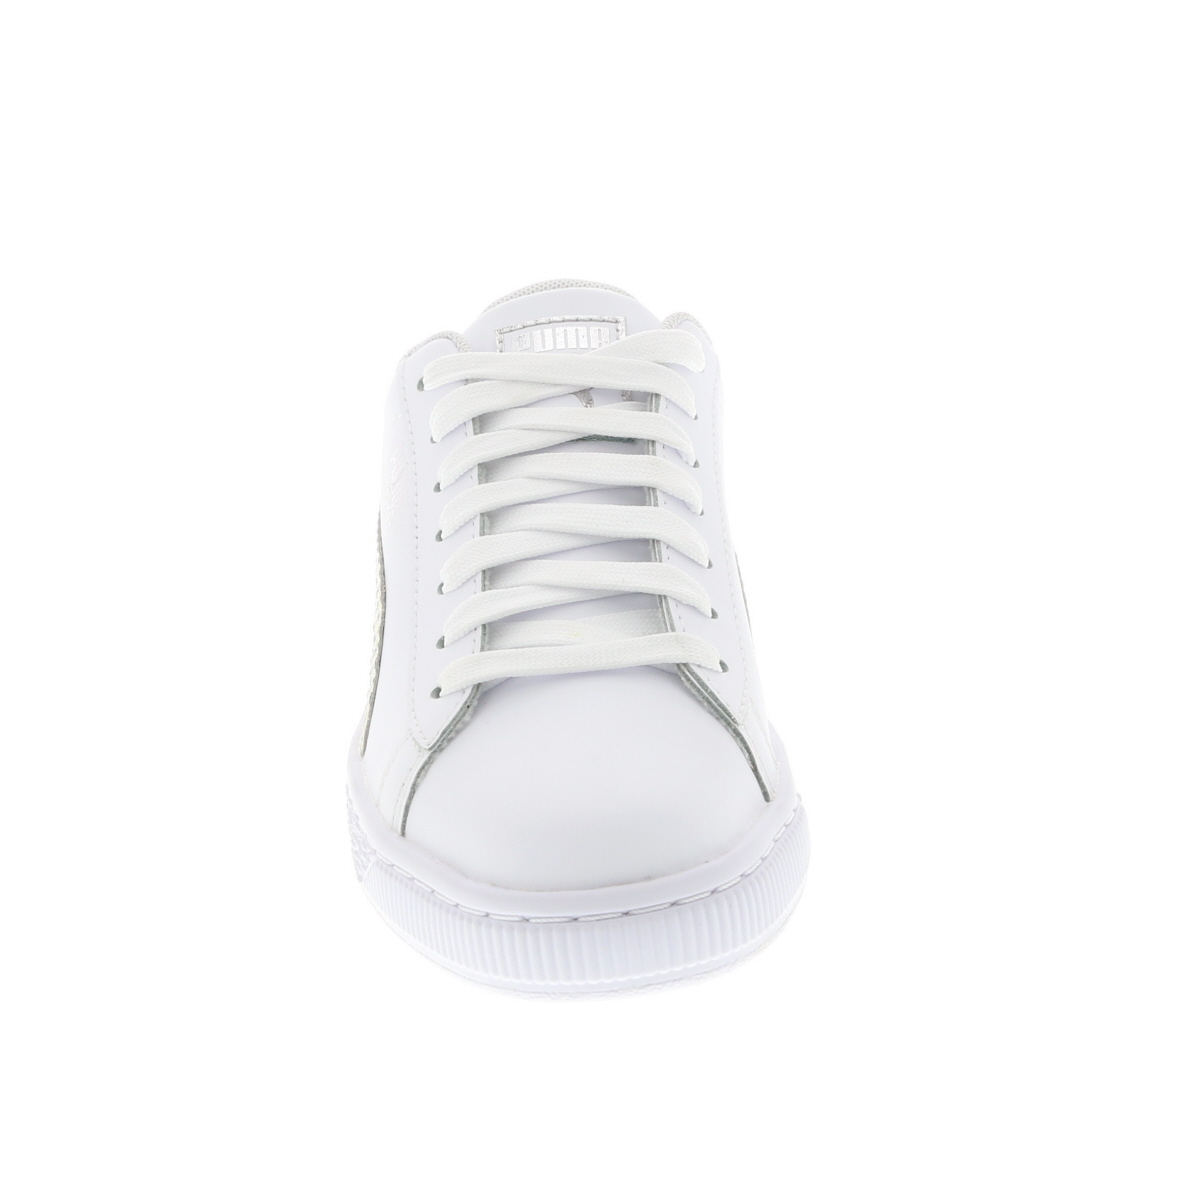 4f23d129960 Puma Sneakers wit - kleertjes.com